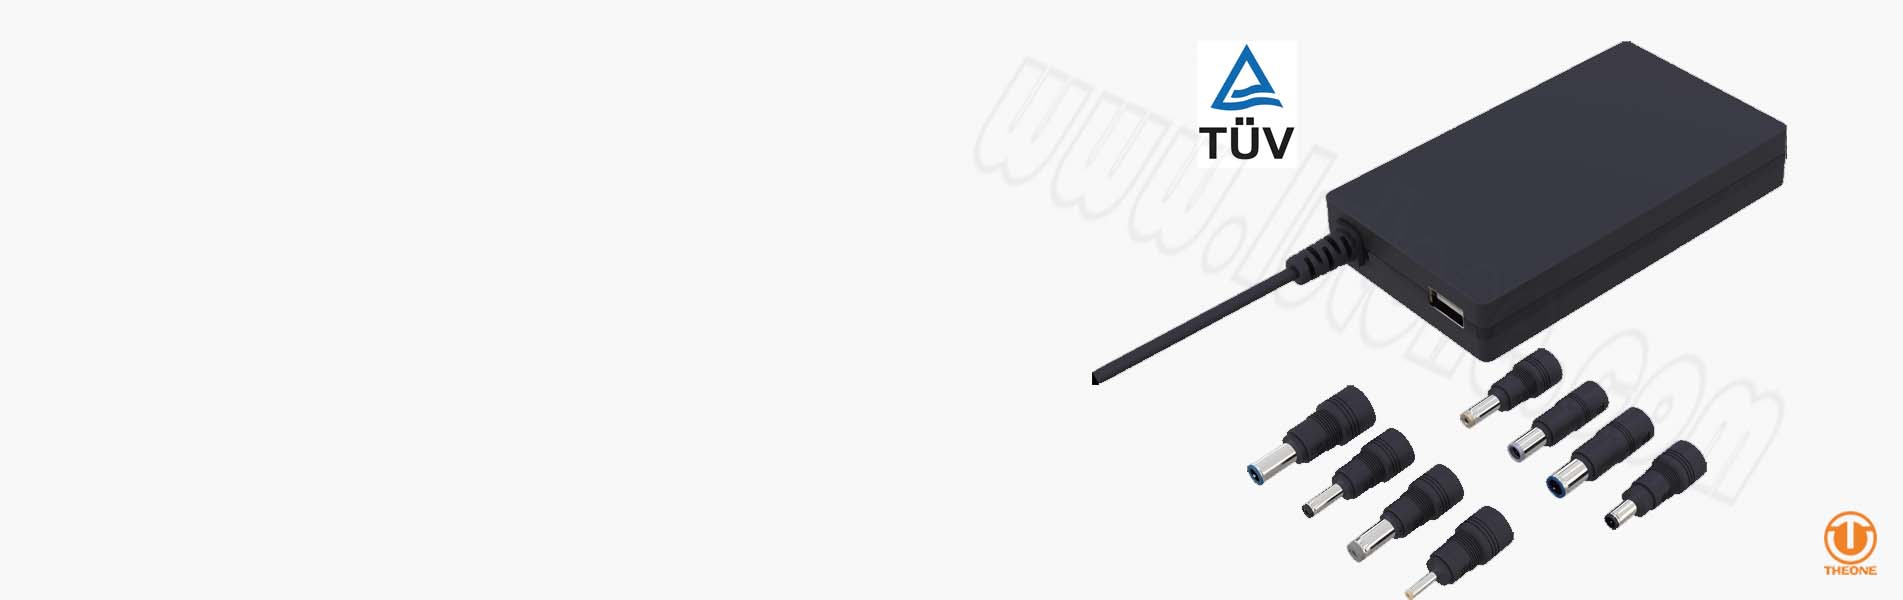 ta09a9-banner universal laptop ac adapter